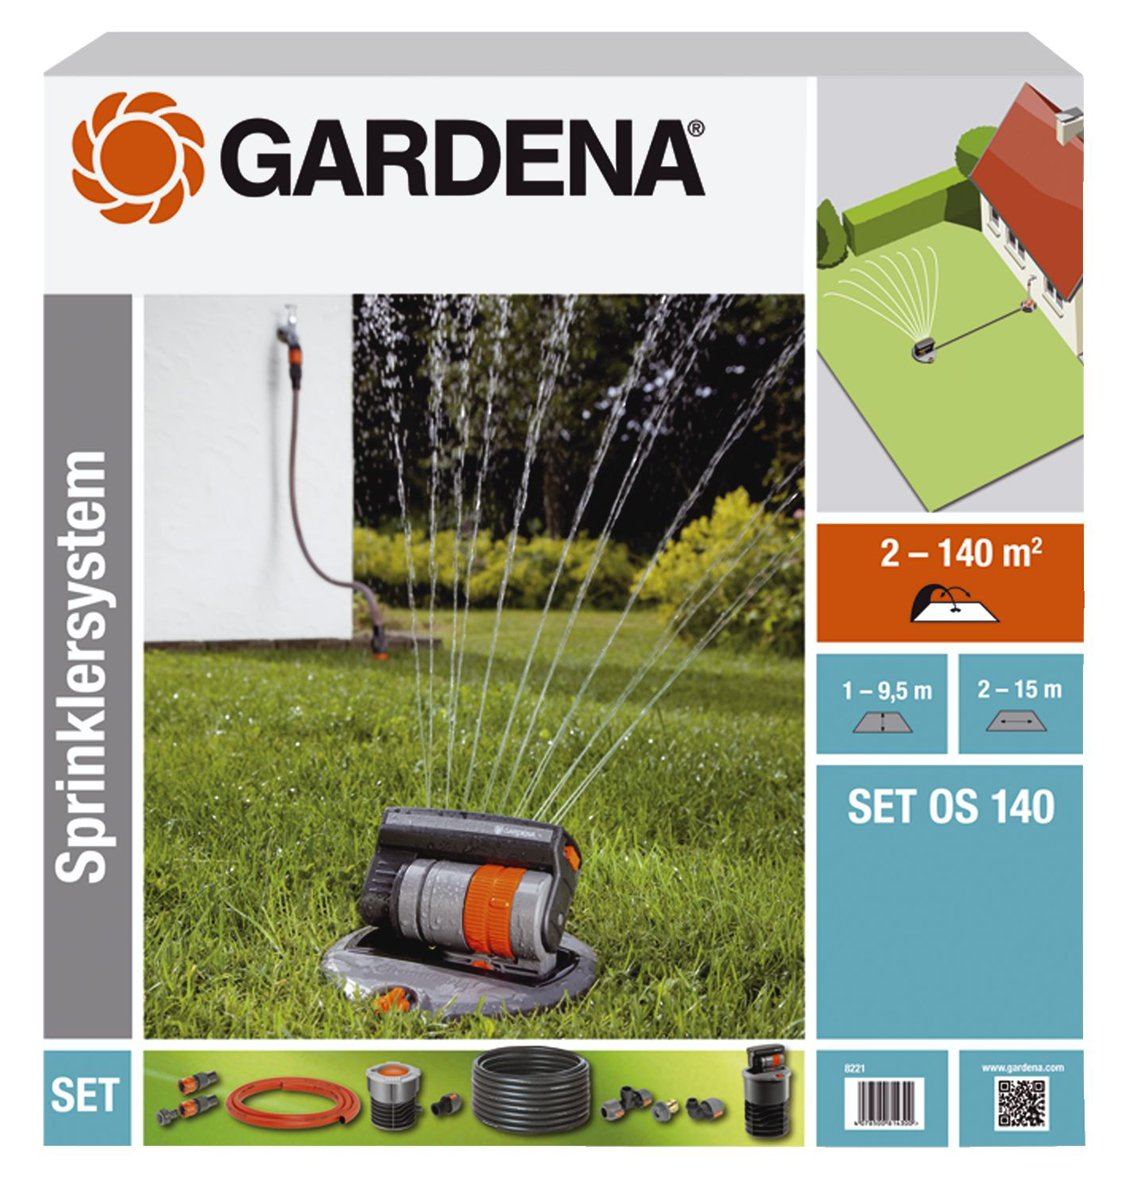 GARDENA OS 140 Complete Set with Pop-Up Oscillating Sprinkler by Gardena